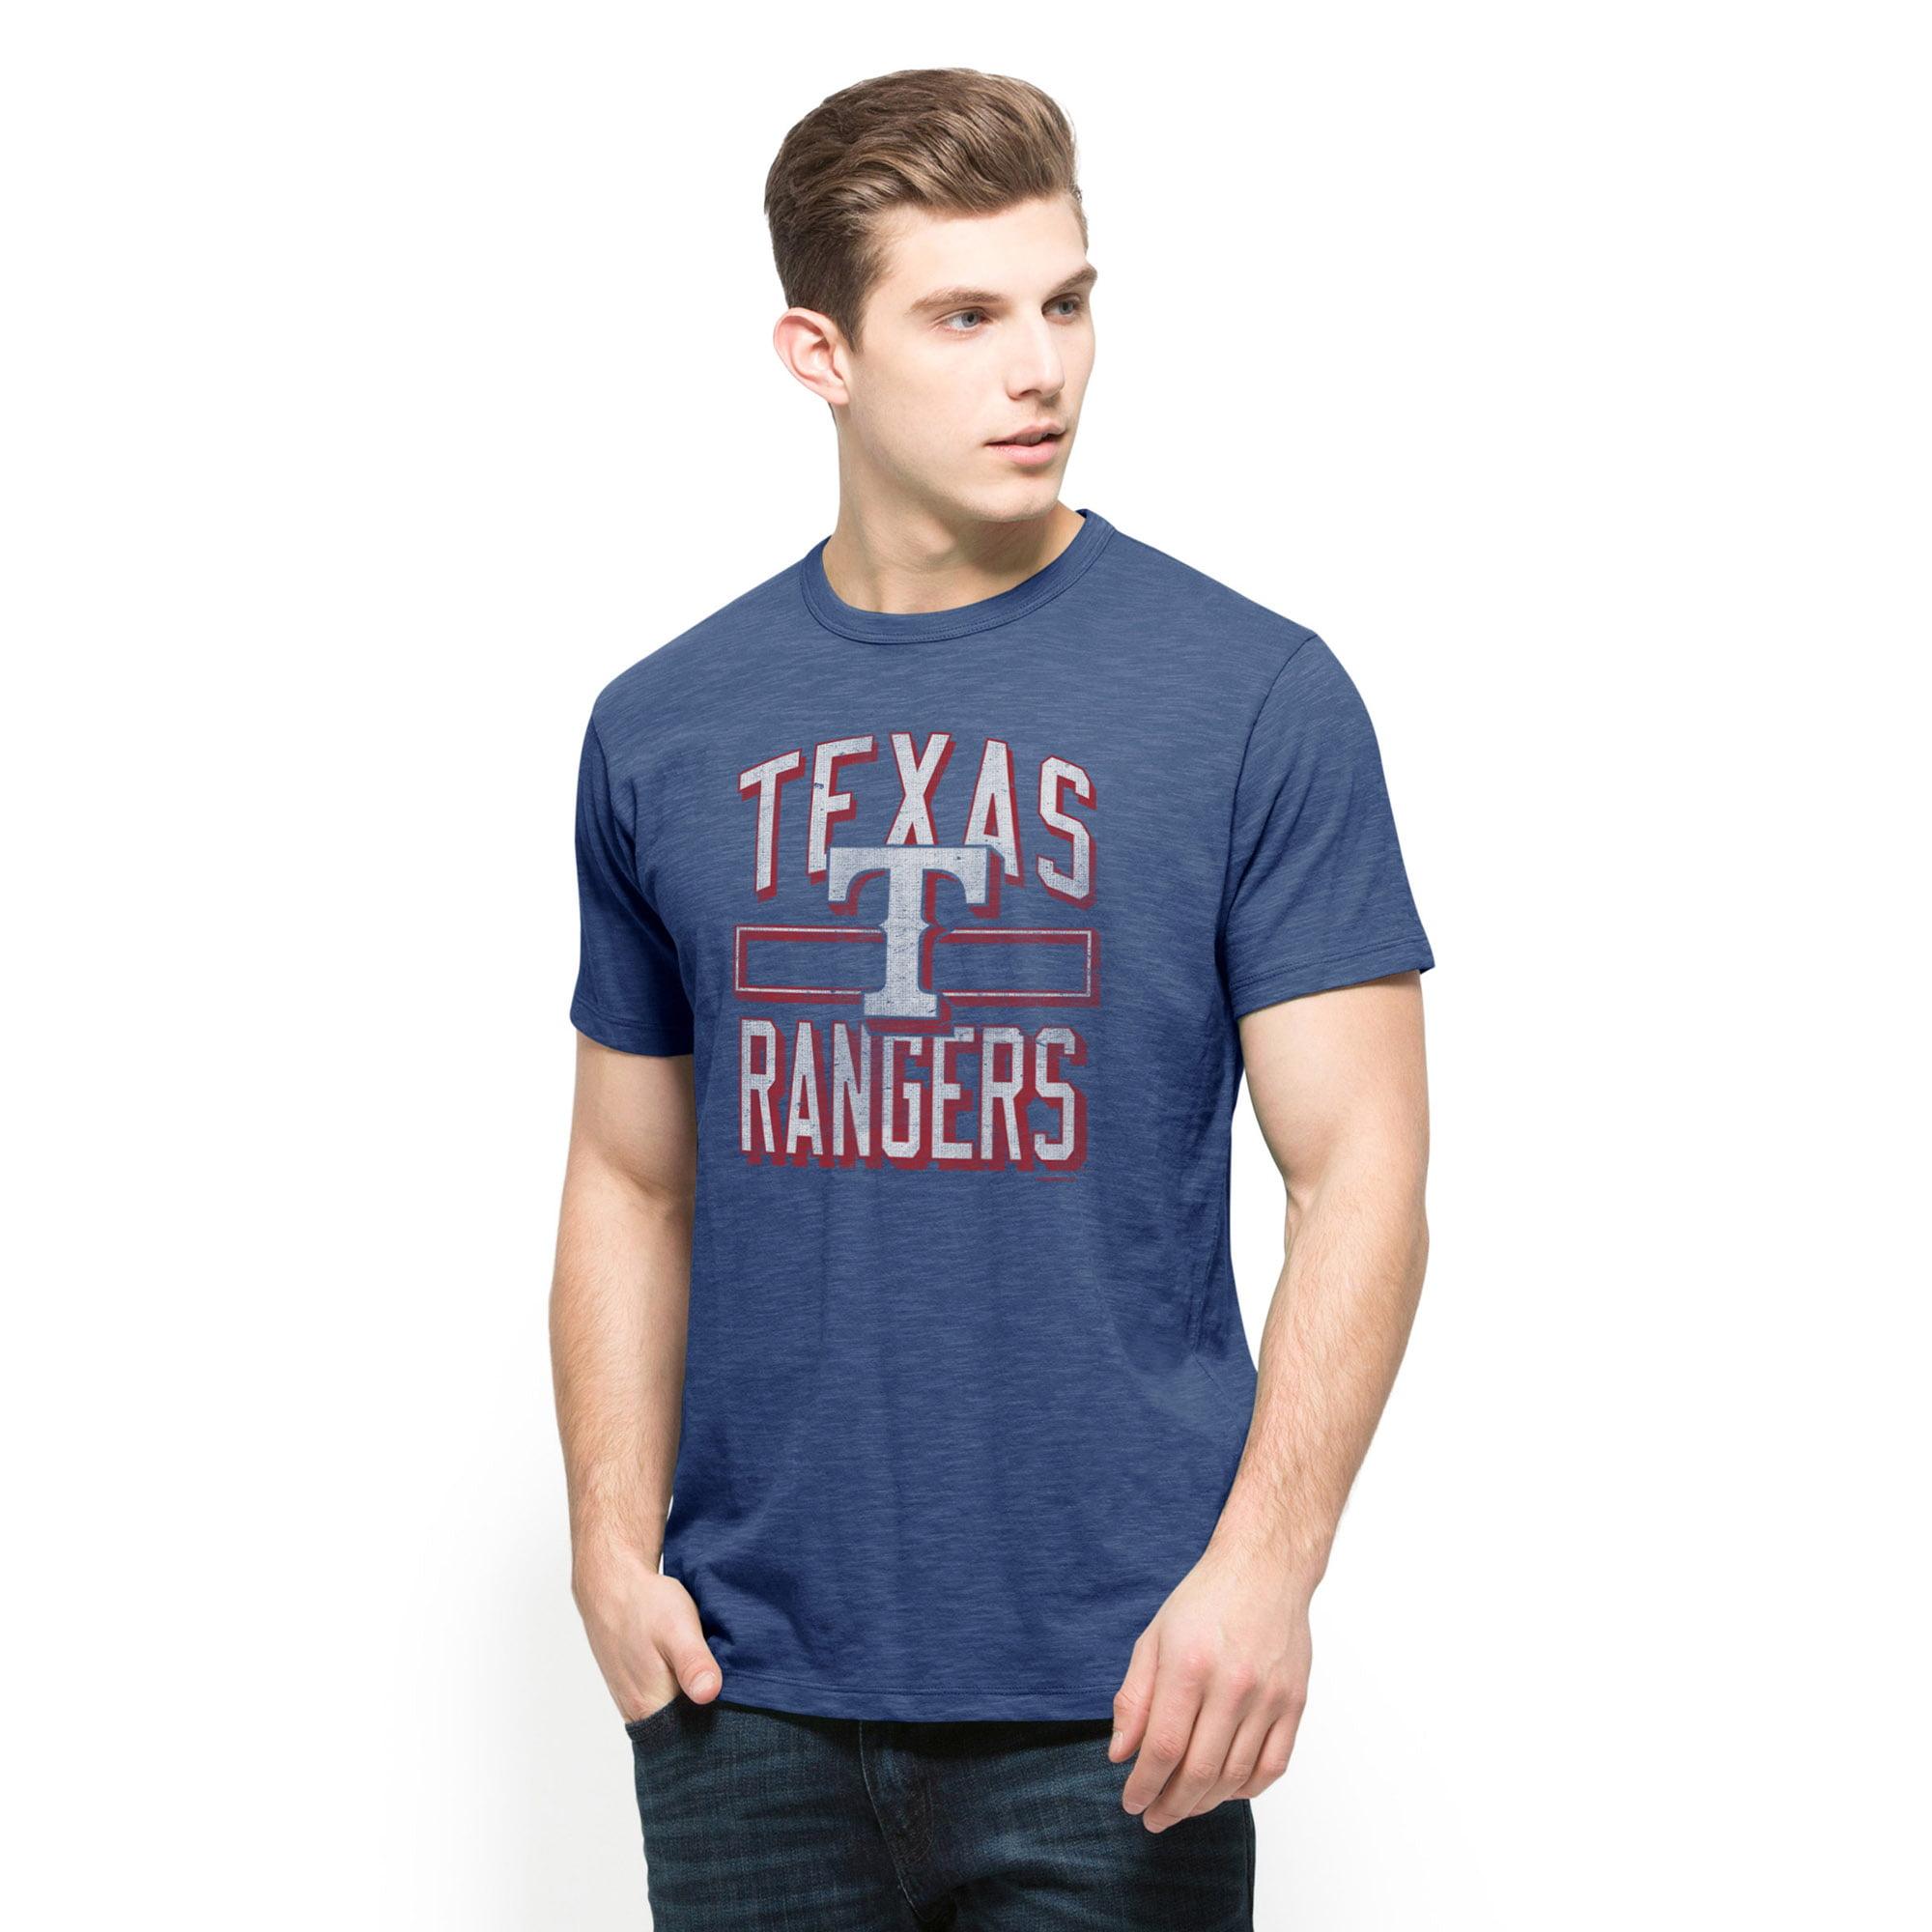 Texas Rangers '47 Scrum T-Shirt - Royal